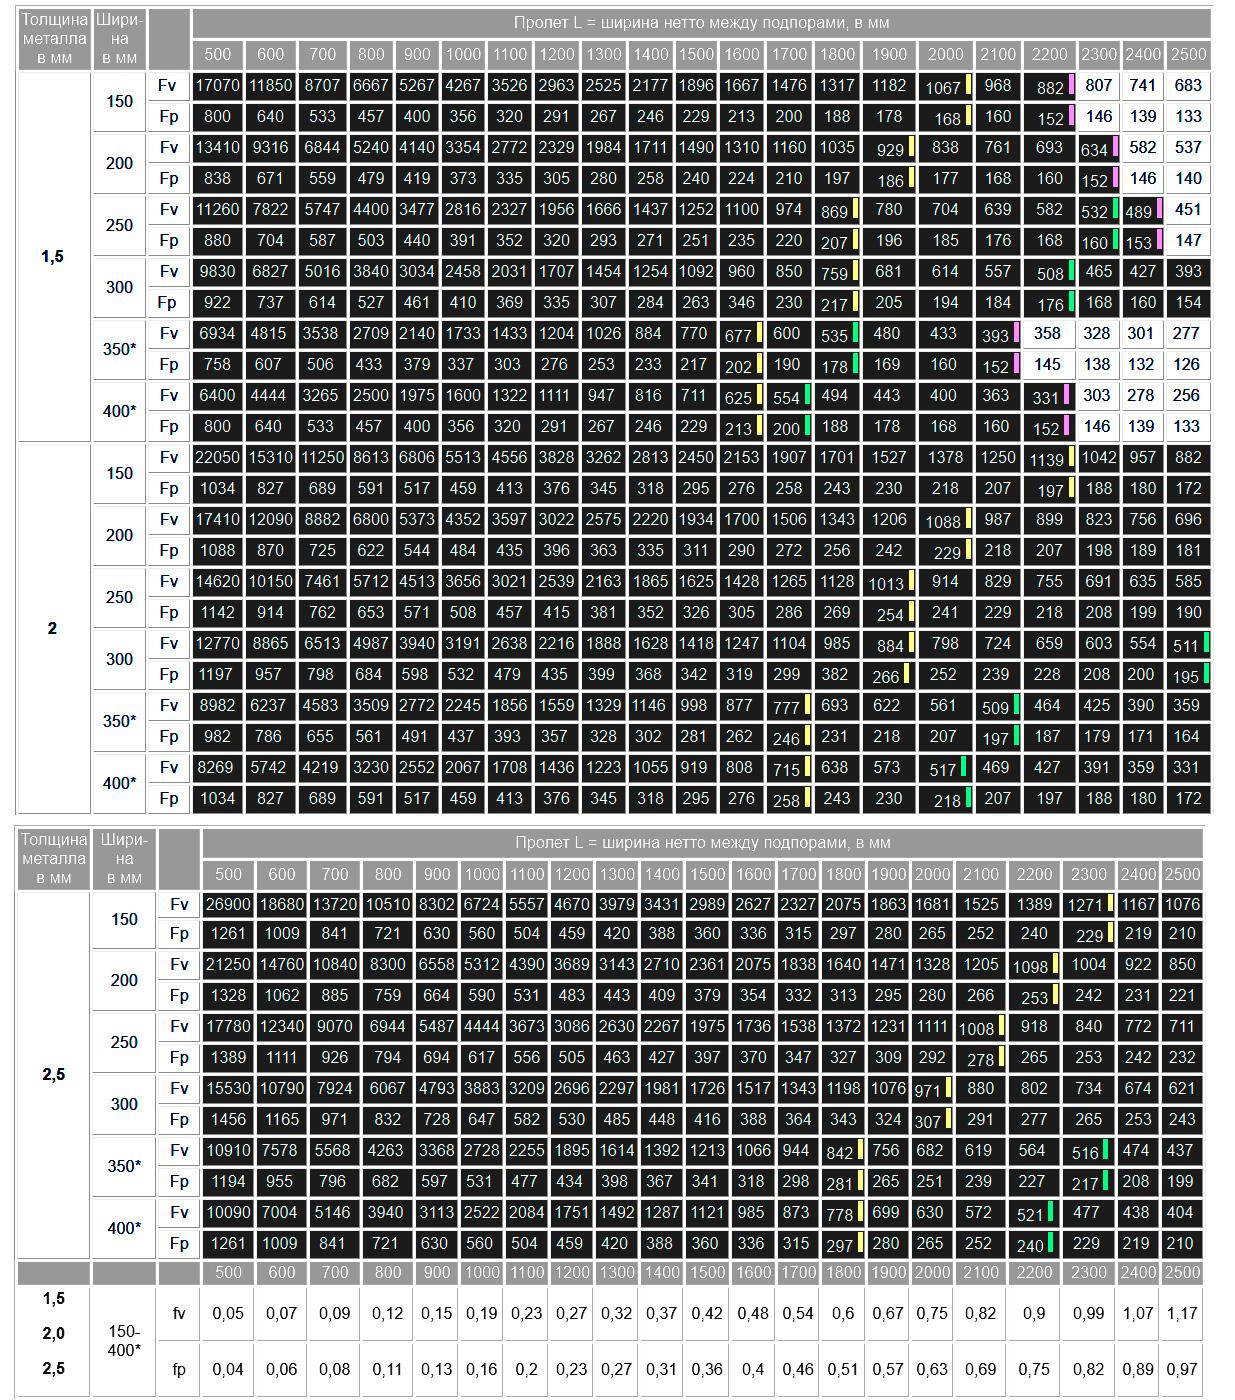 Таблица нагрузок тип Круглый высота 75 мм